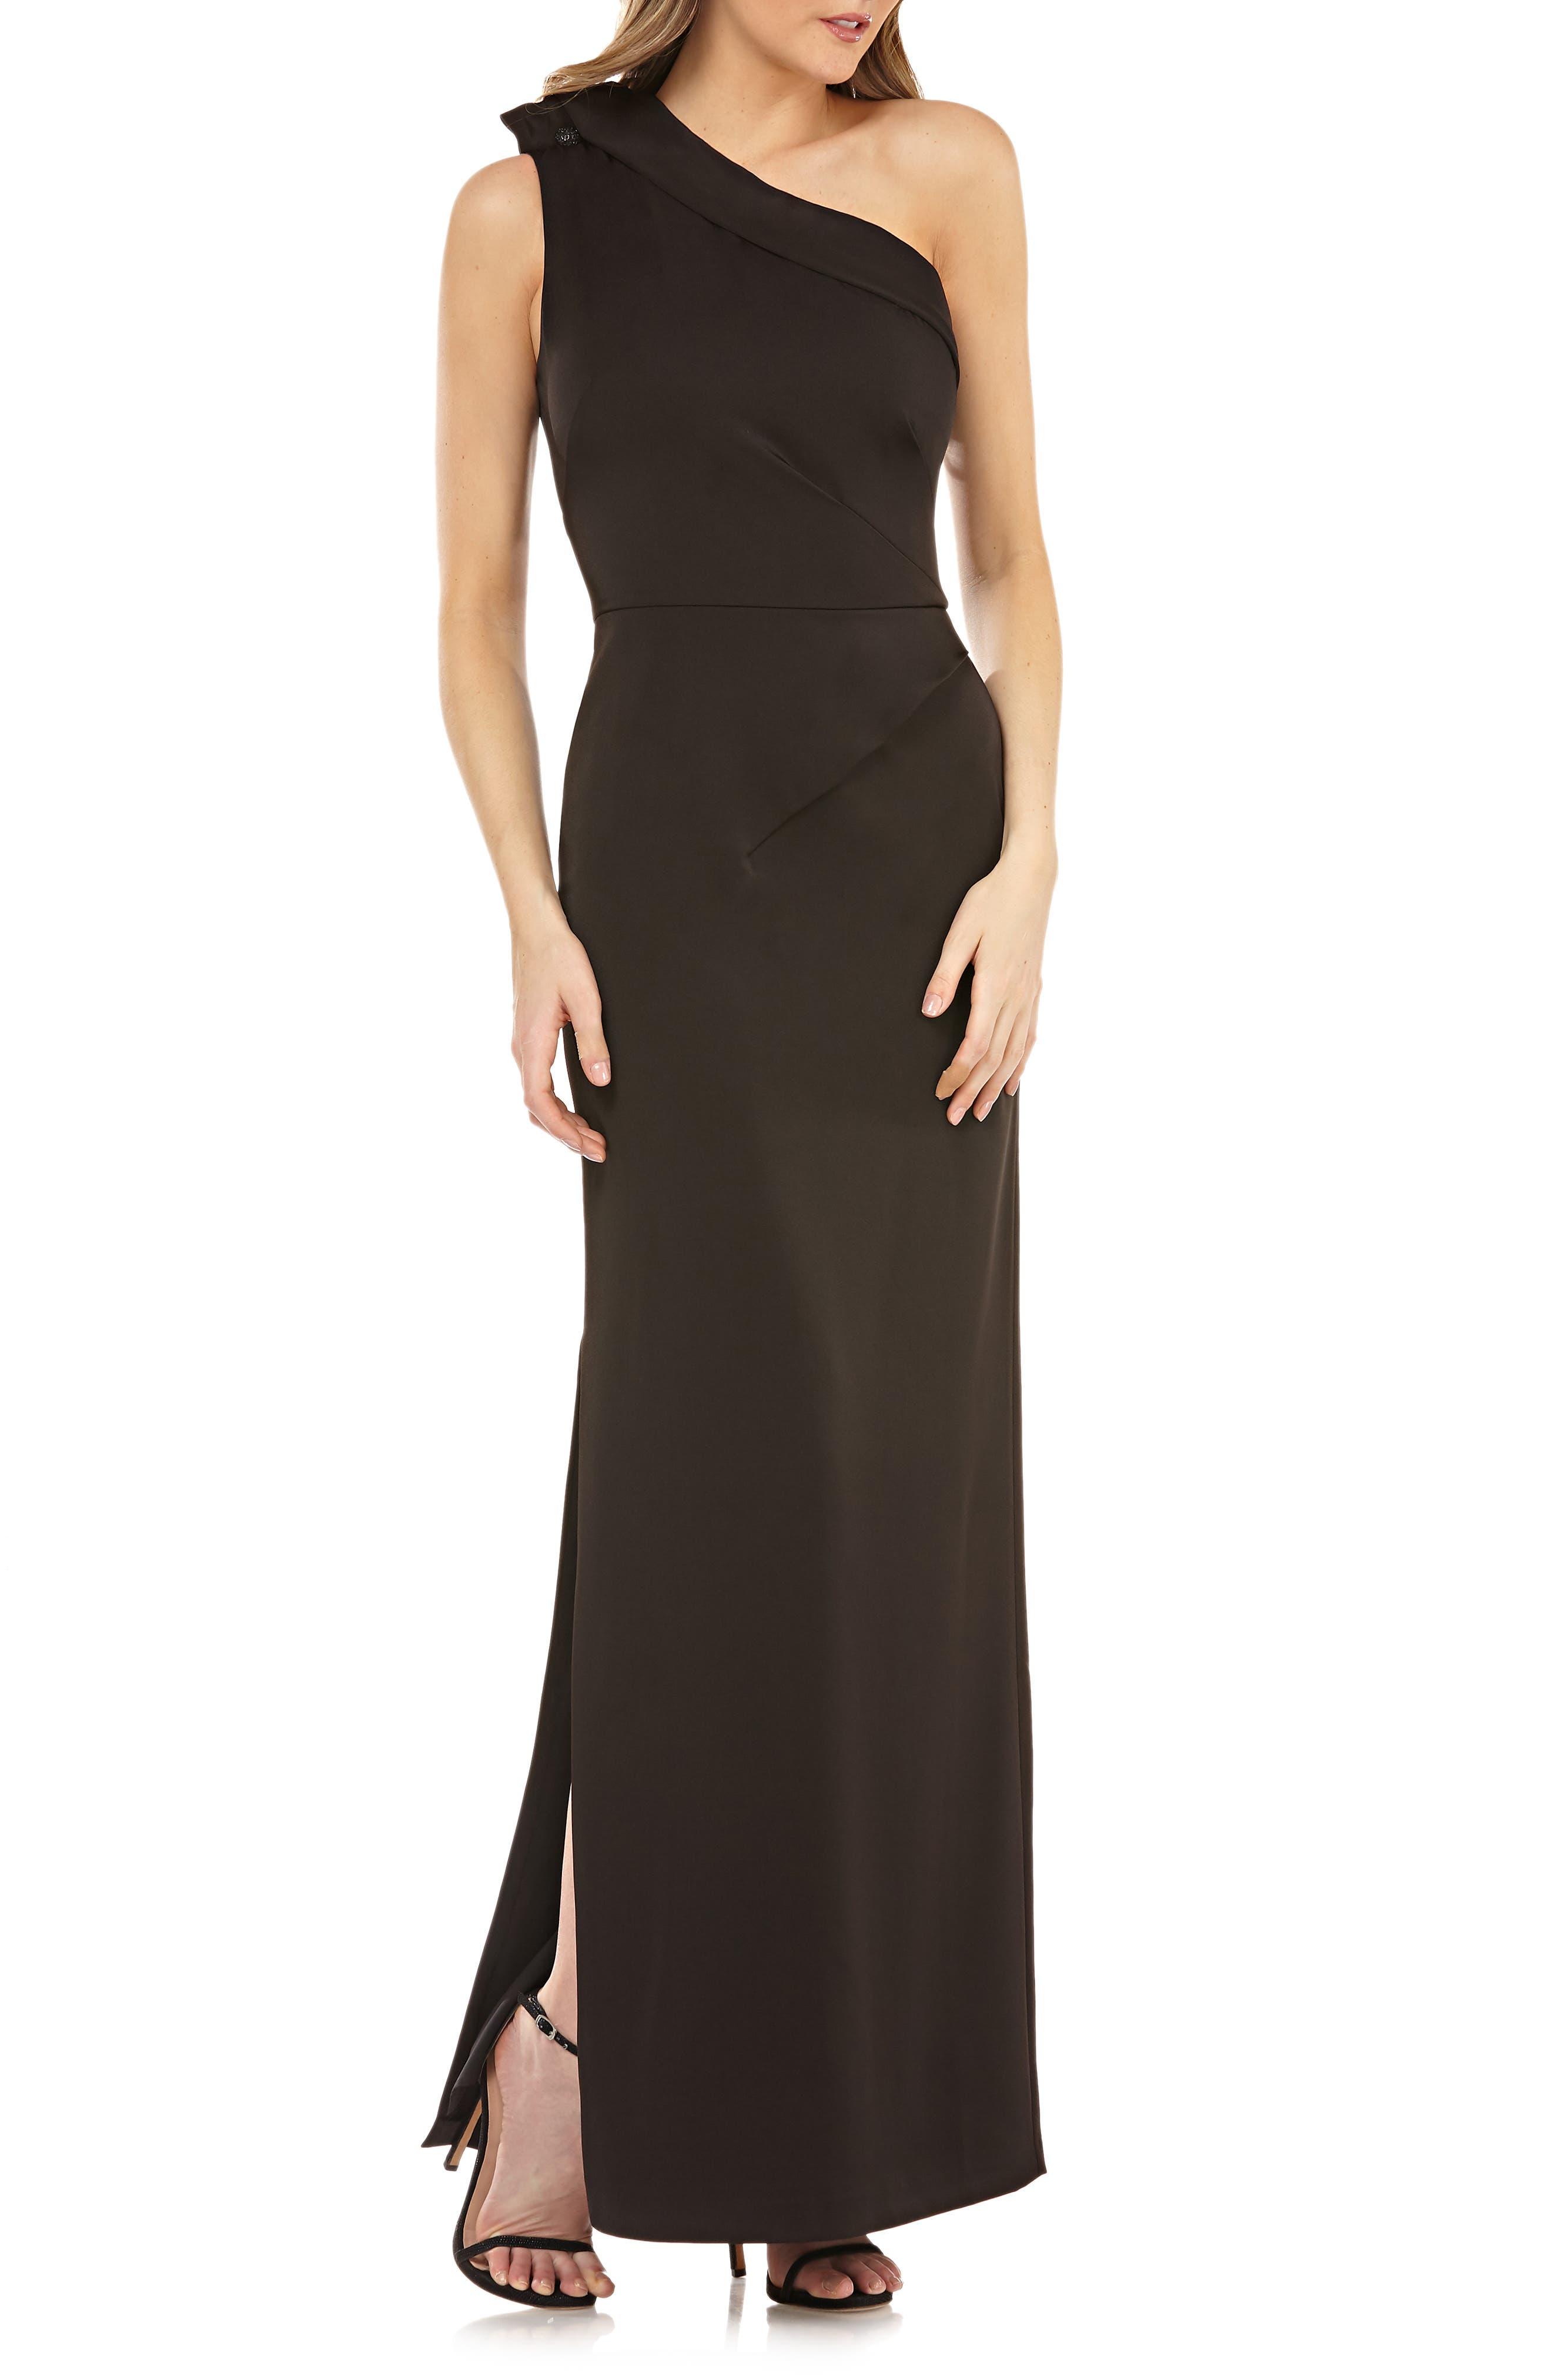 KAY UNGER Jeweled One-Shoulder Gown W/ Sunburst Pleats in Black